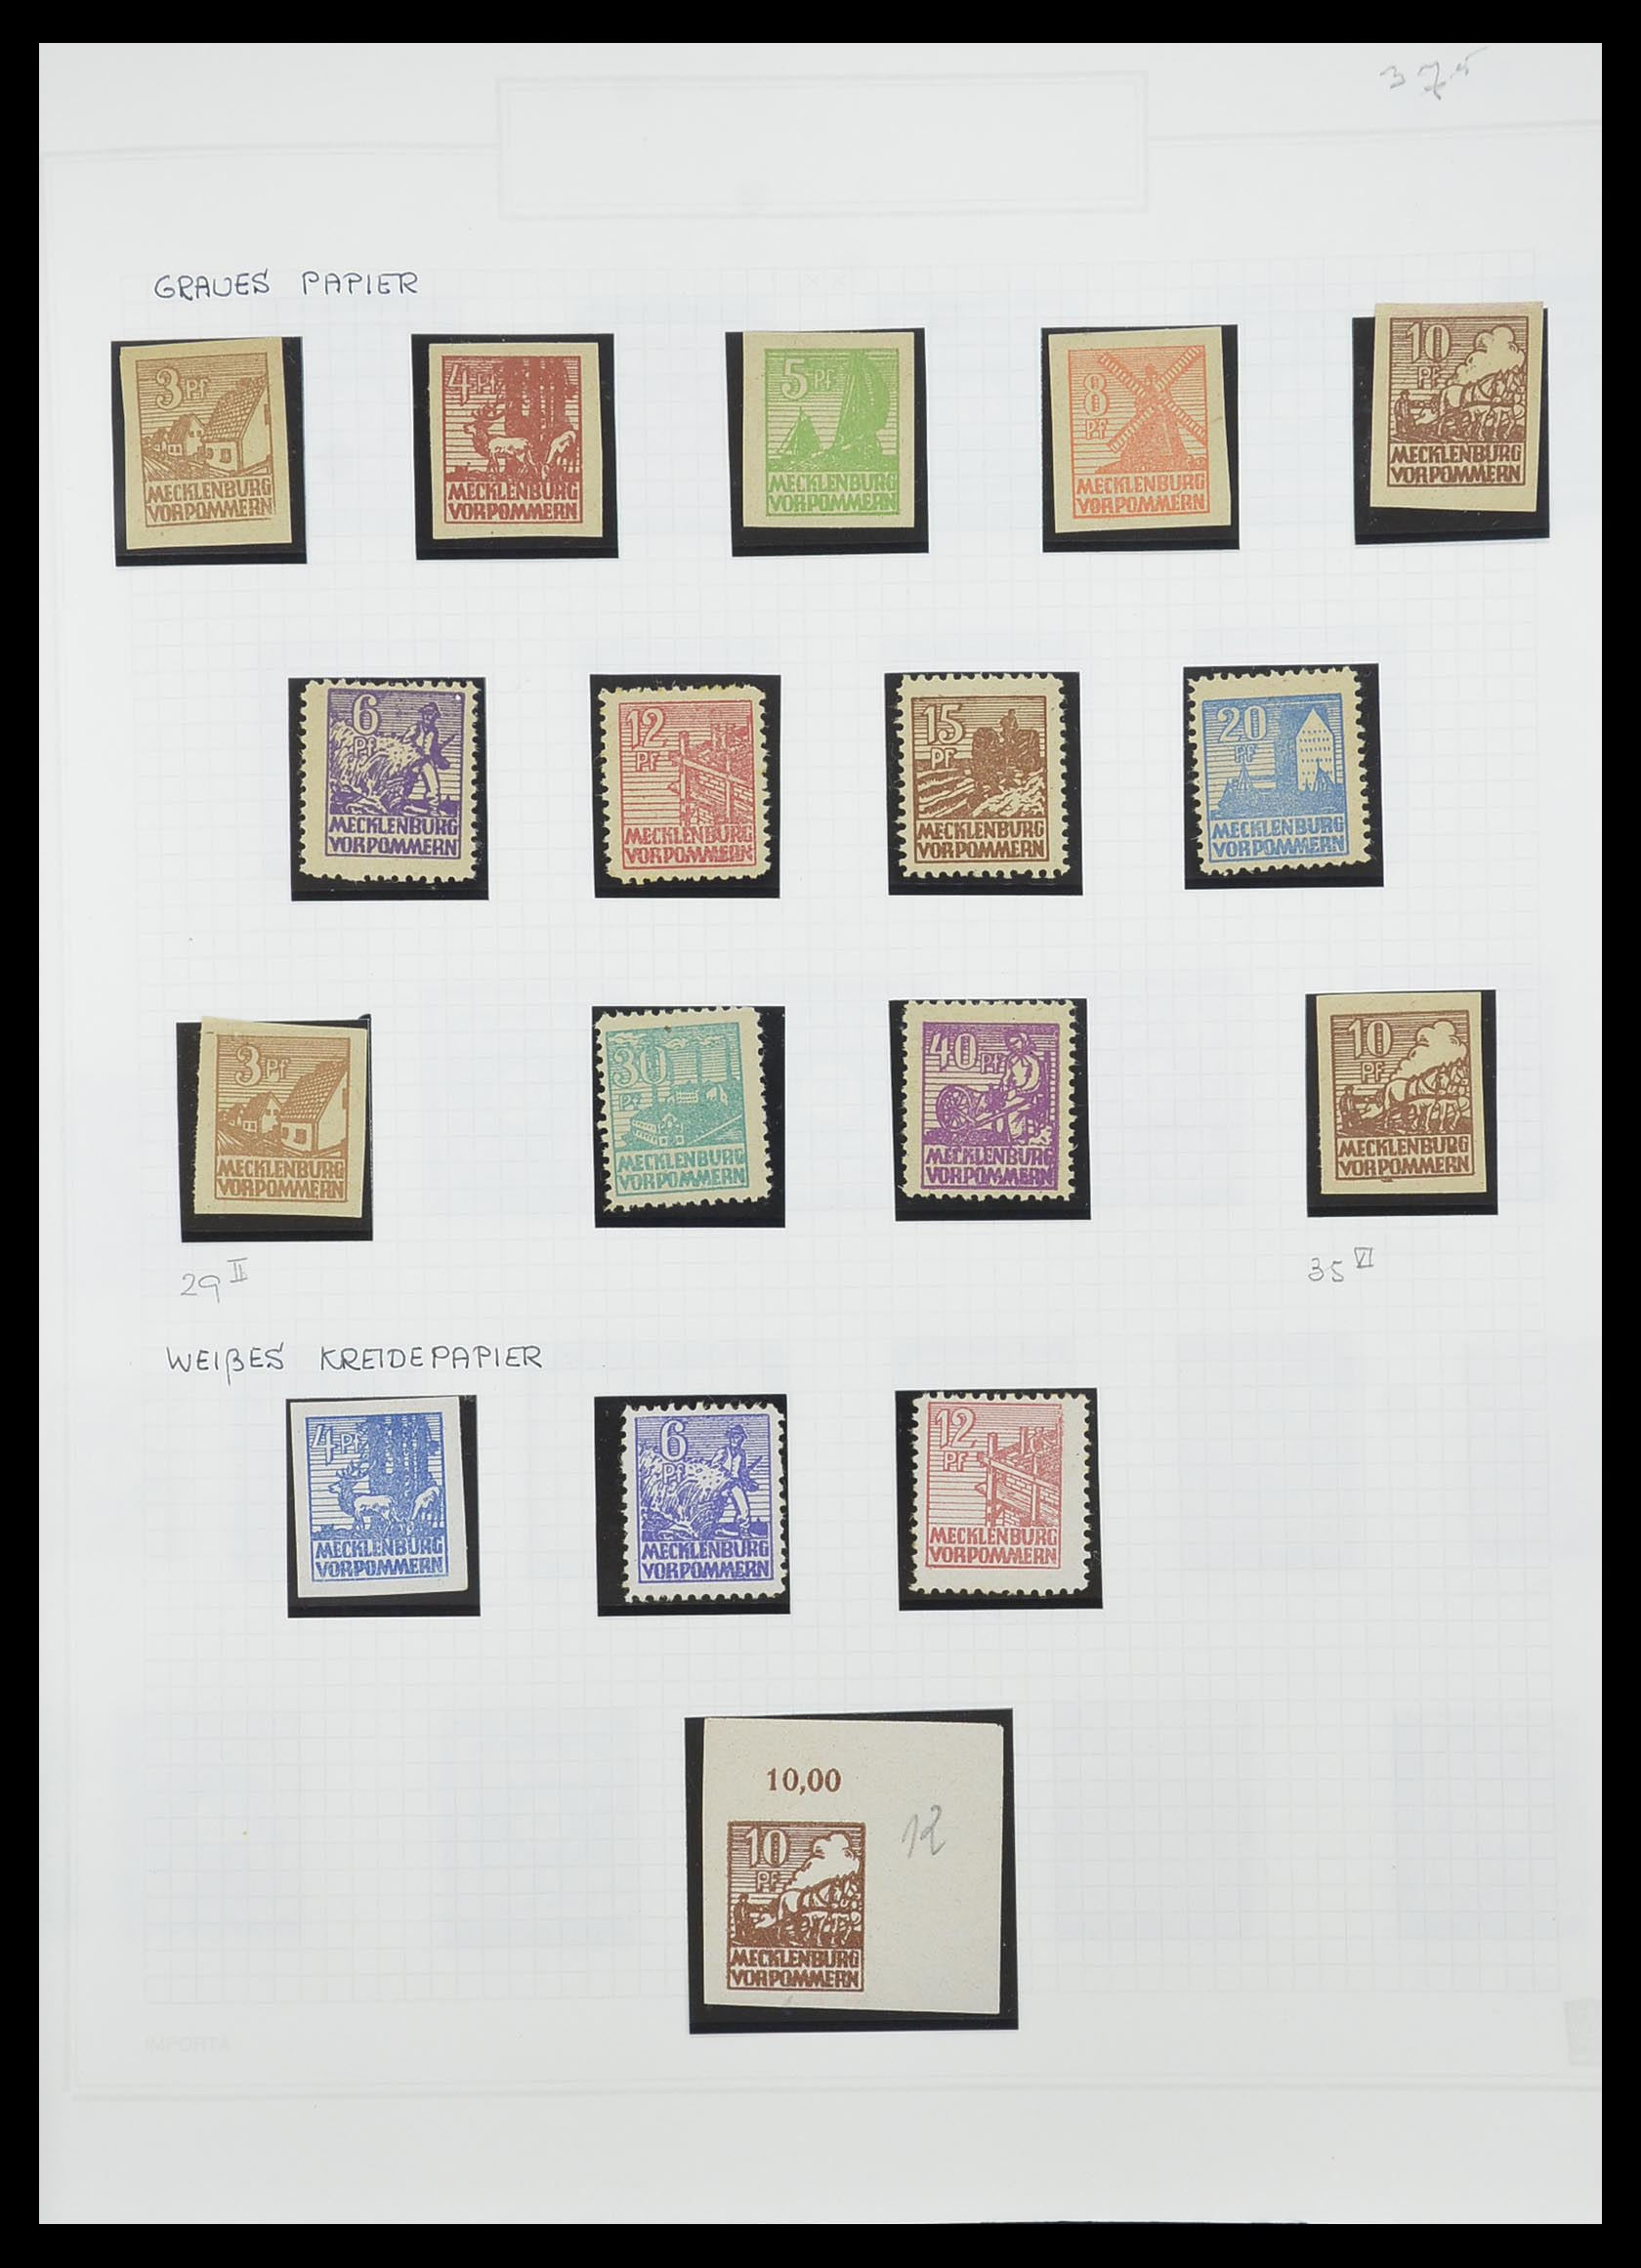 33698 015 - Postzegelverzameling 33698 Sovjet Zone 1945-1948.